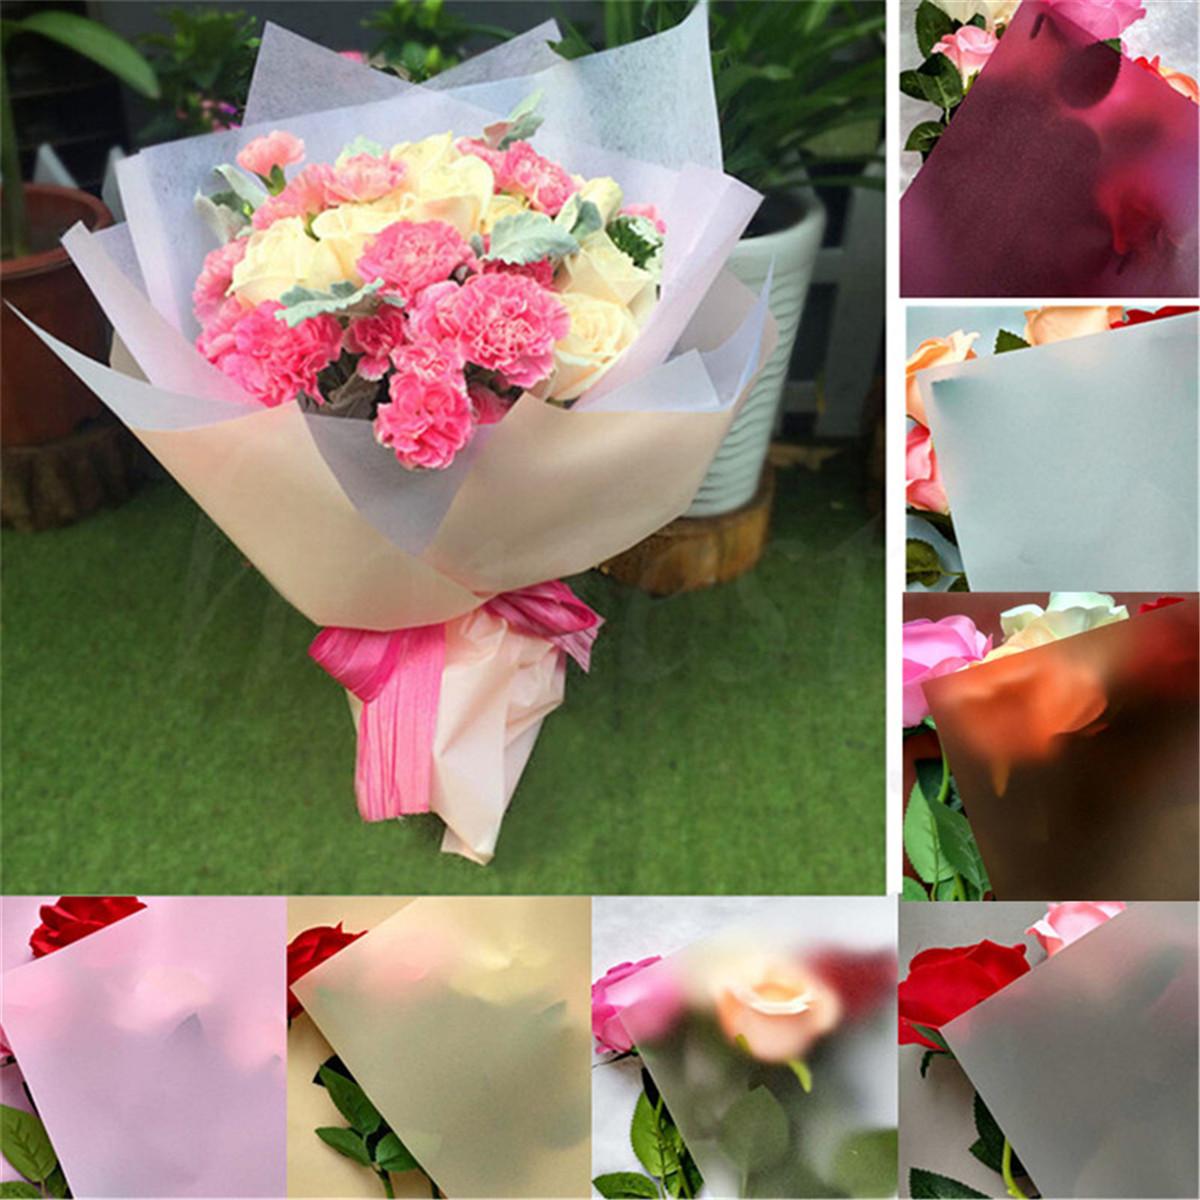 10 Sheet Flower Wrapping Paper Waterproof Florist Art Wedding